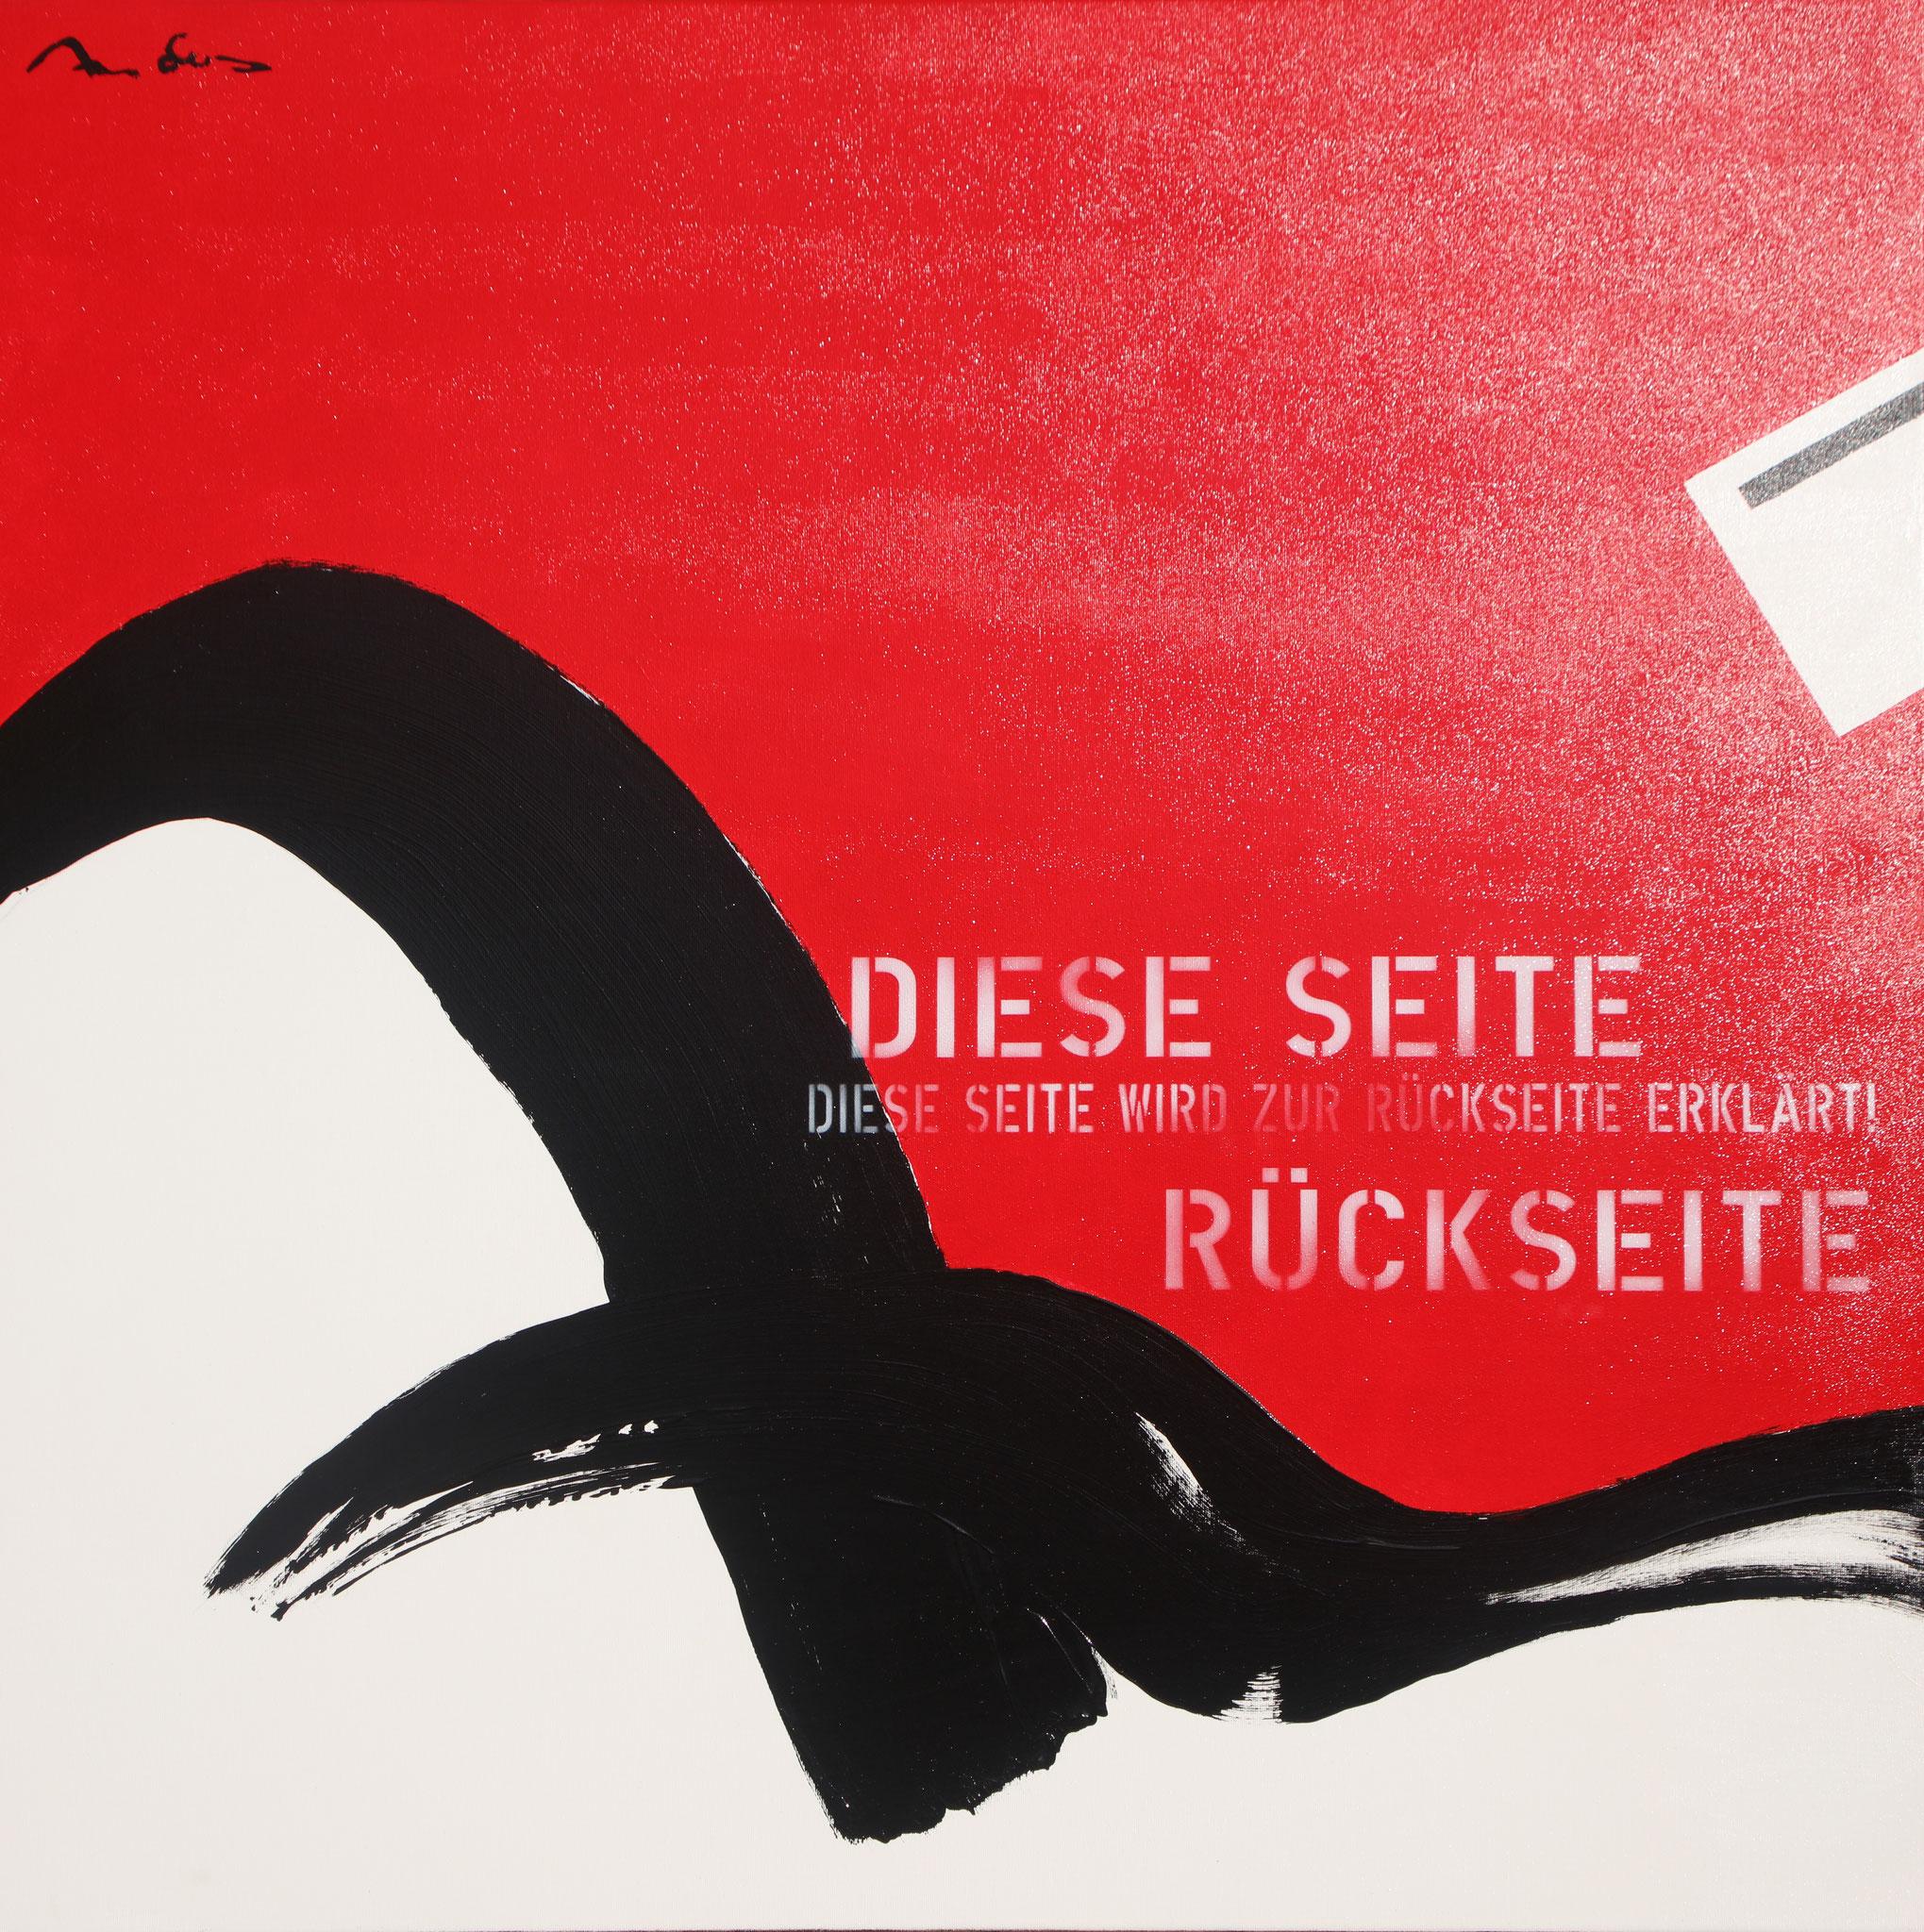 Heureka VI - Rückseite - Acryl-/Mischtechnik auf Leinwand - 100 x 100 cm